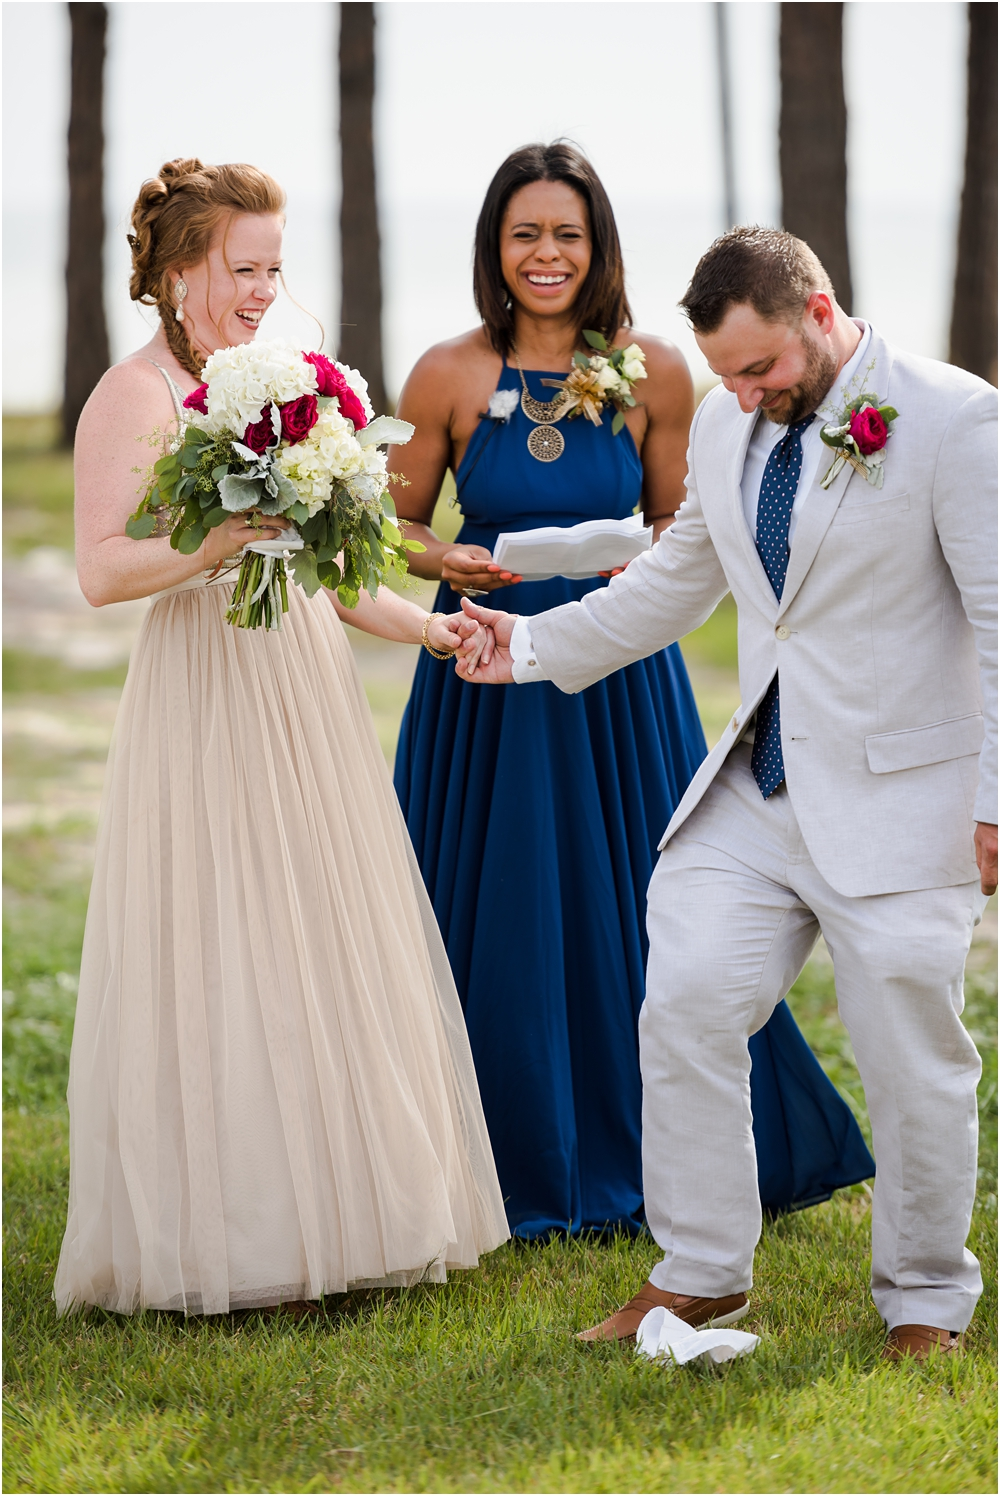 st-joe-florida-wedding-photographer-kiersten-grant-58.jpg